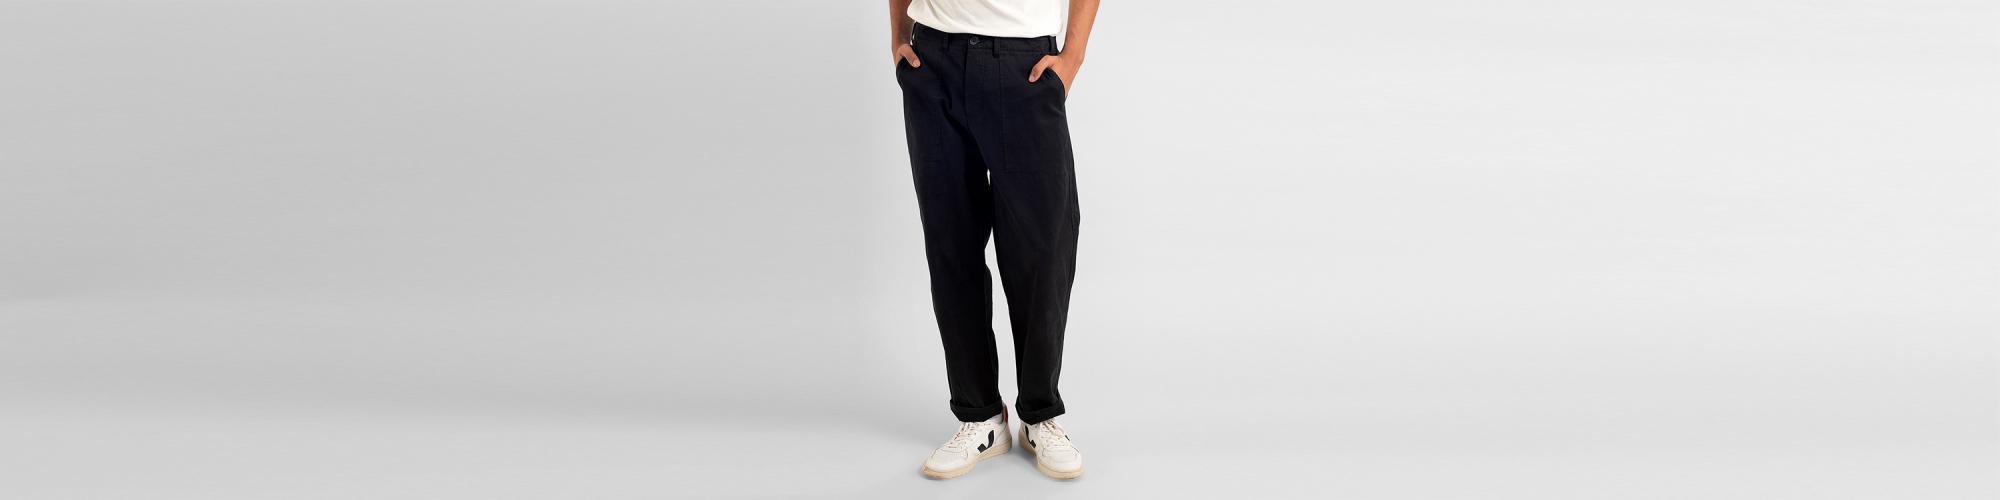 Men's Hosen & Shorts